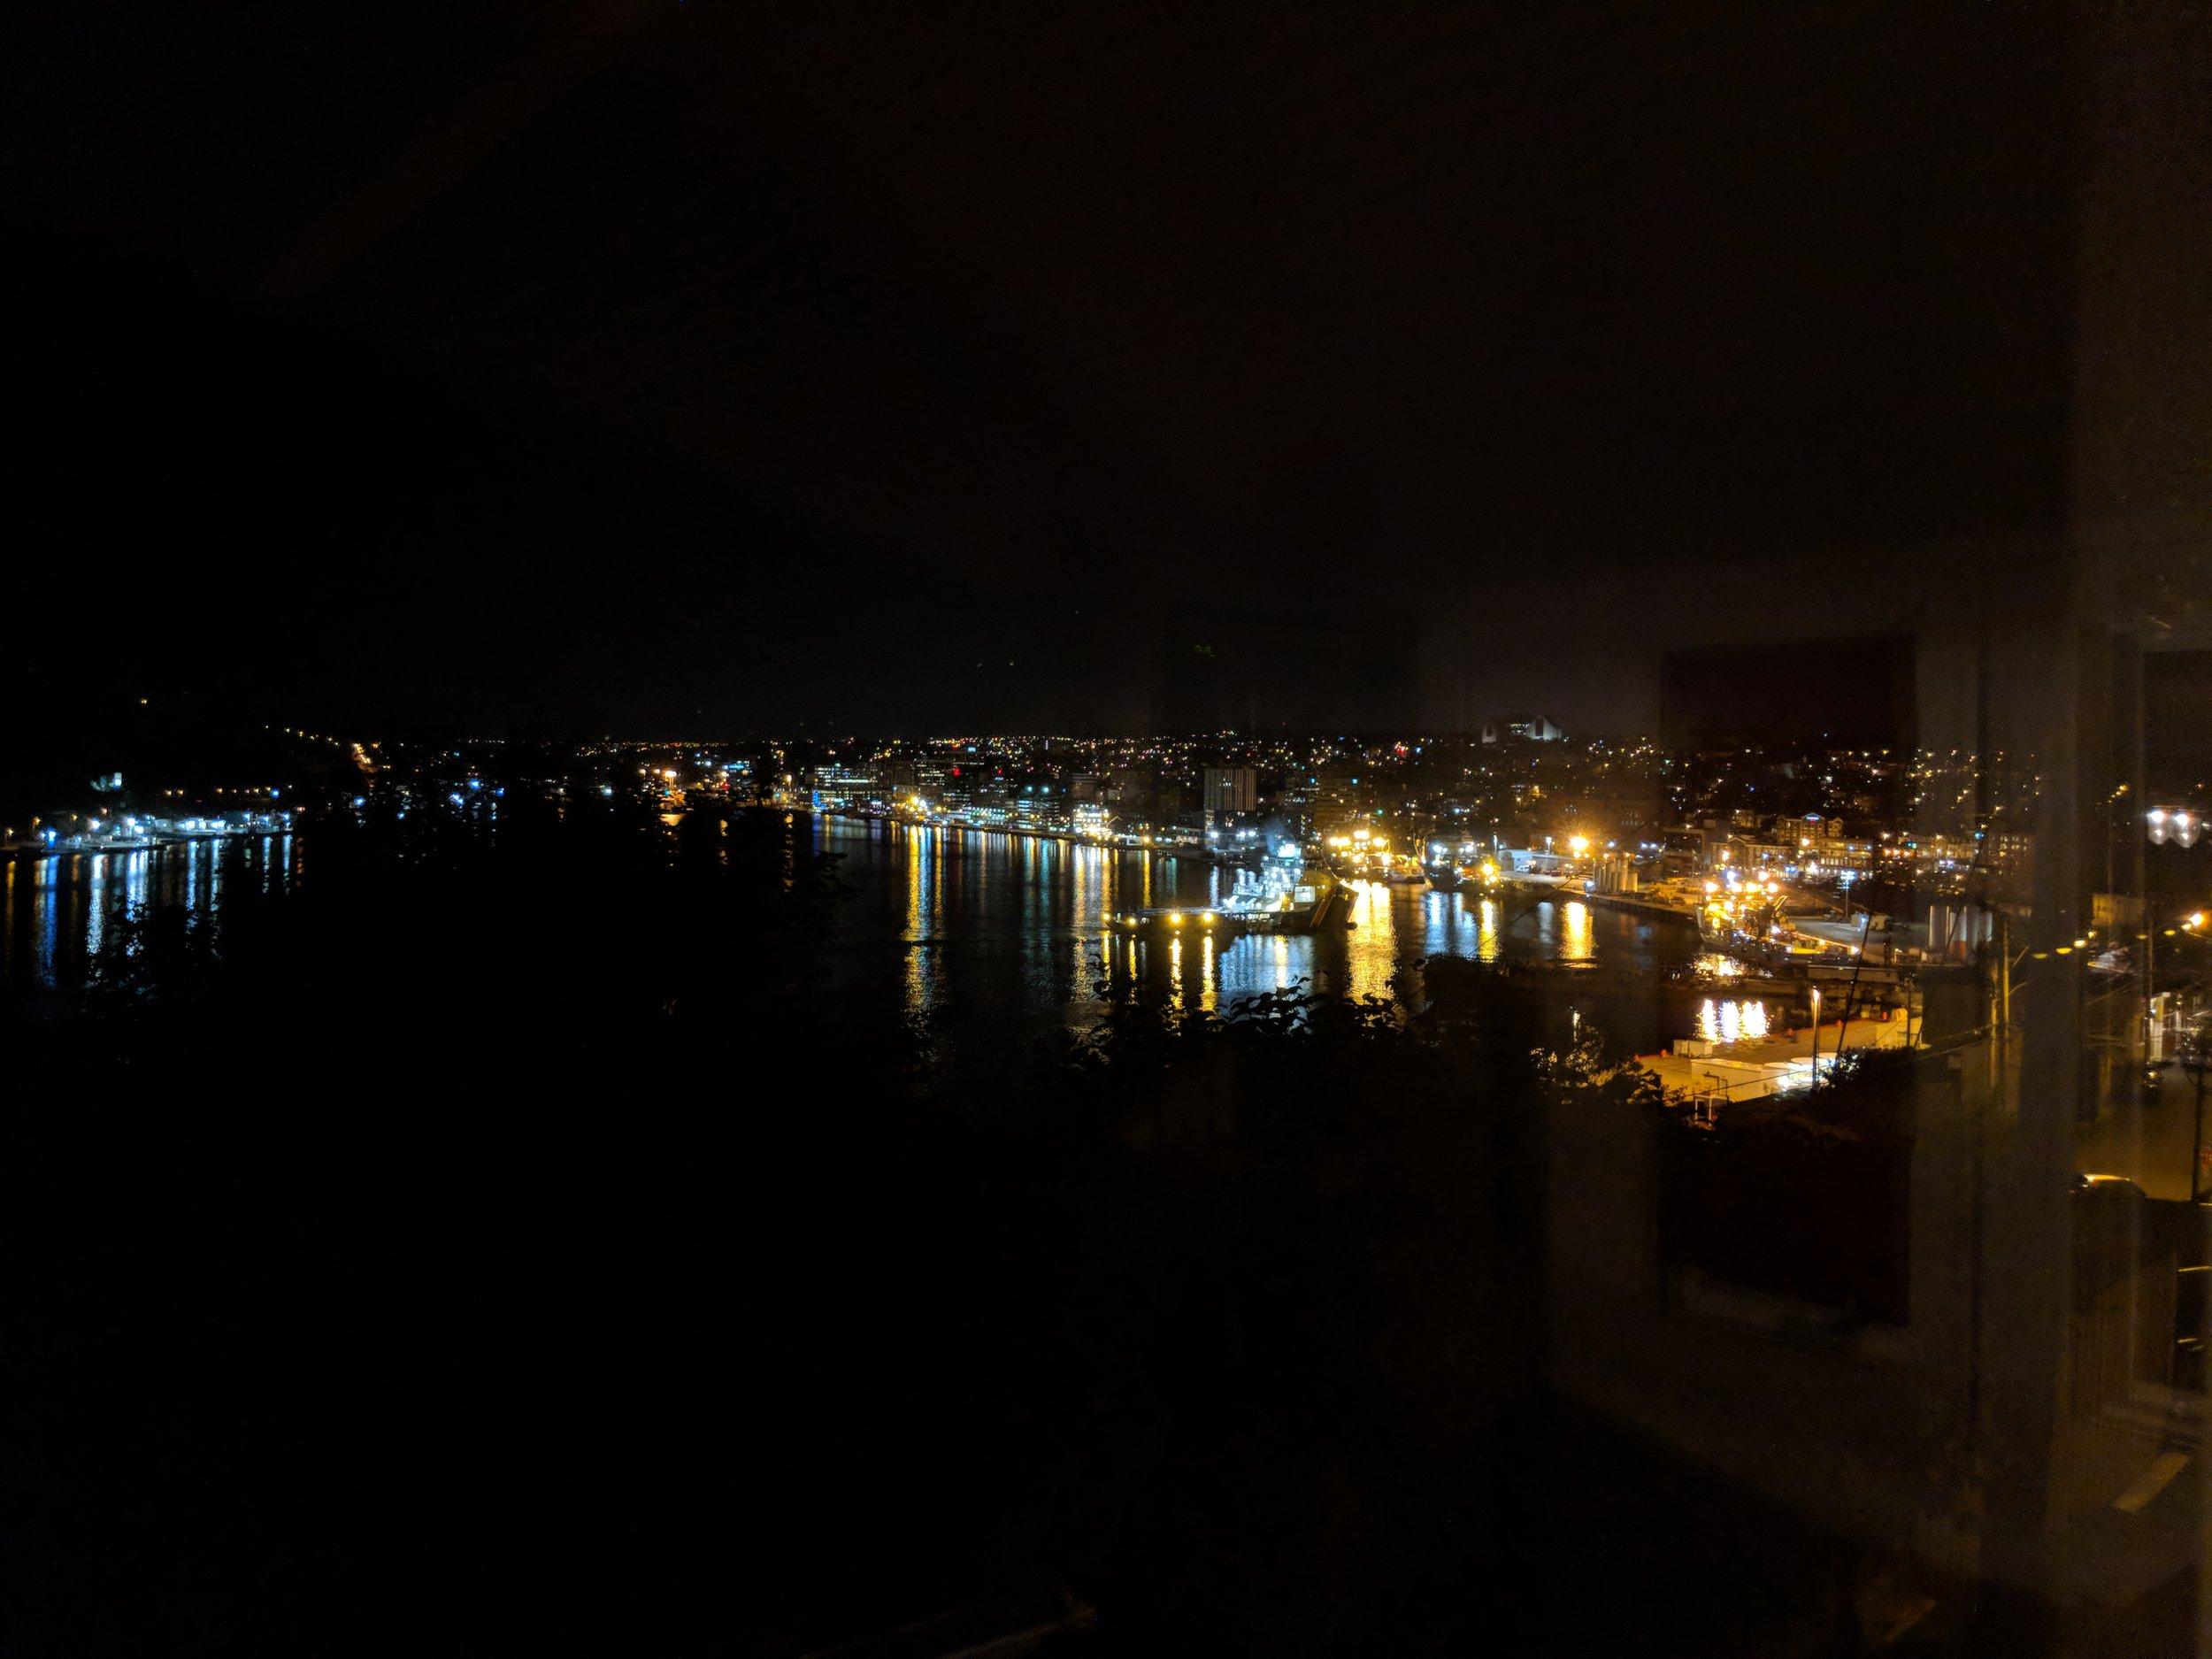 St. John's Newfoundland, Canada.